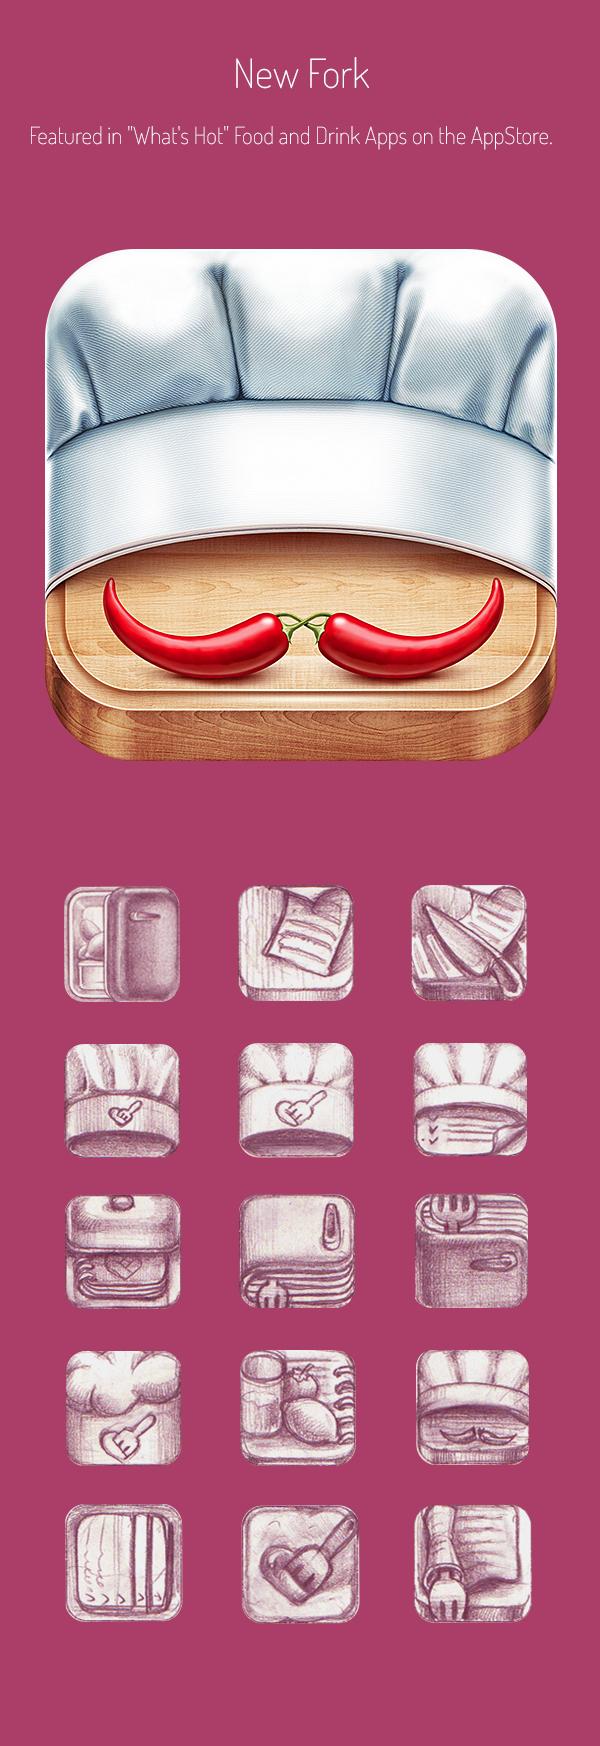 app icon Icon icons application design ios iphone iPad appstore designer tennis instagram weather camera cooking